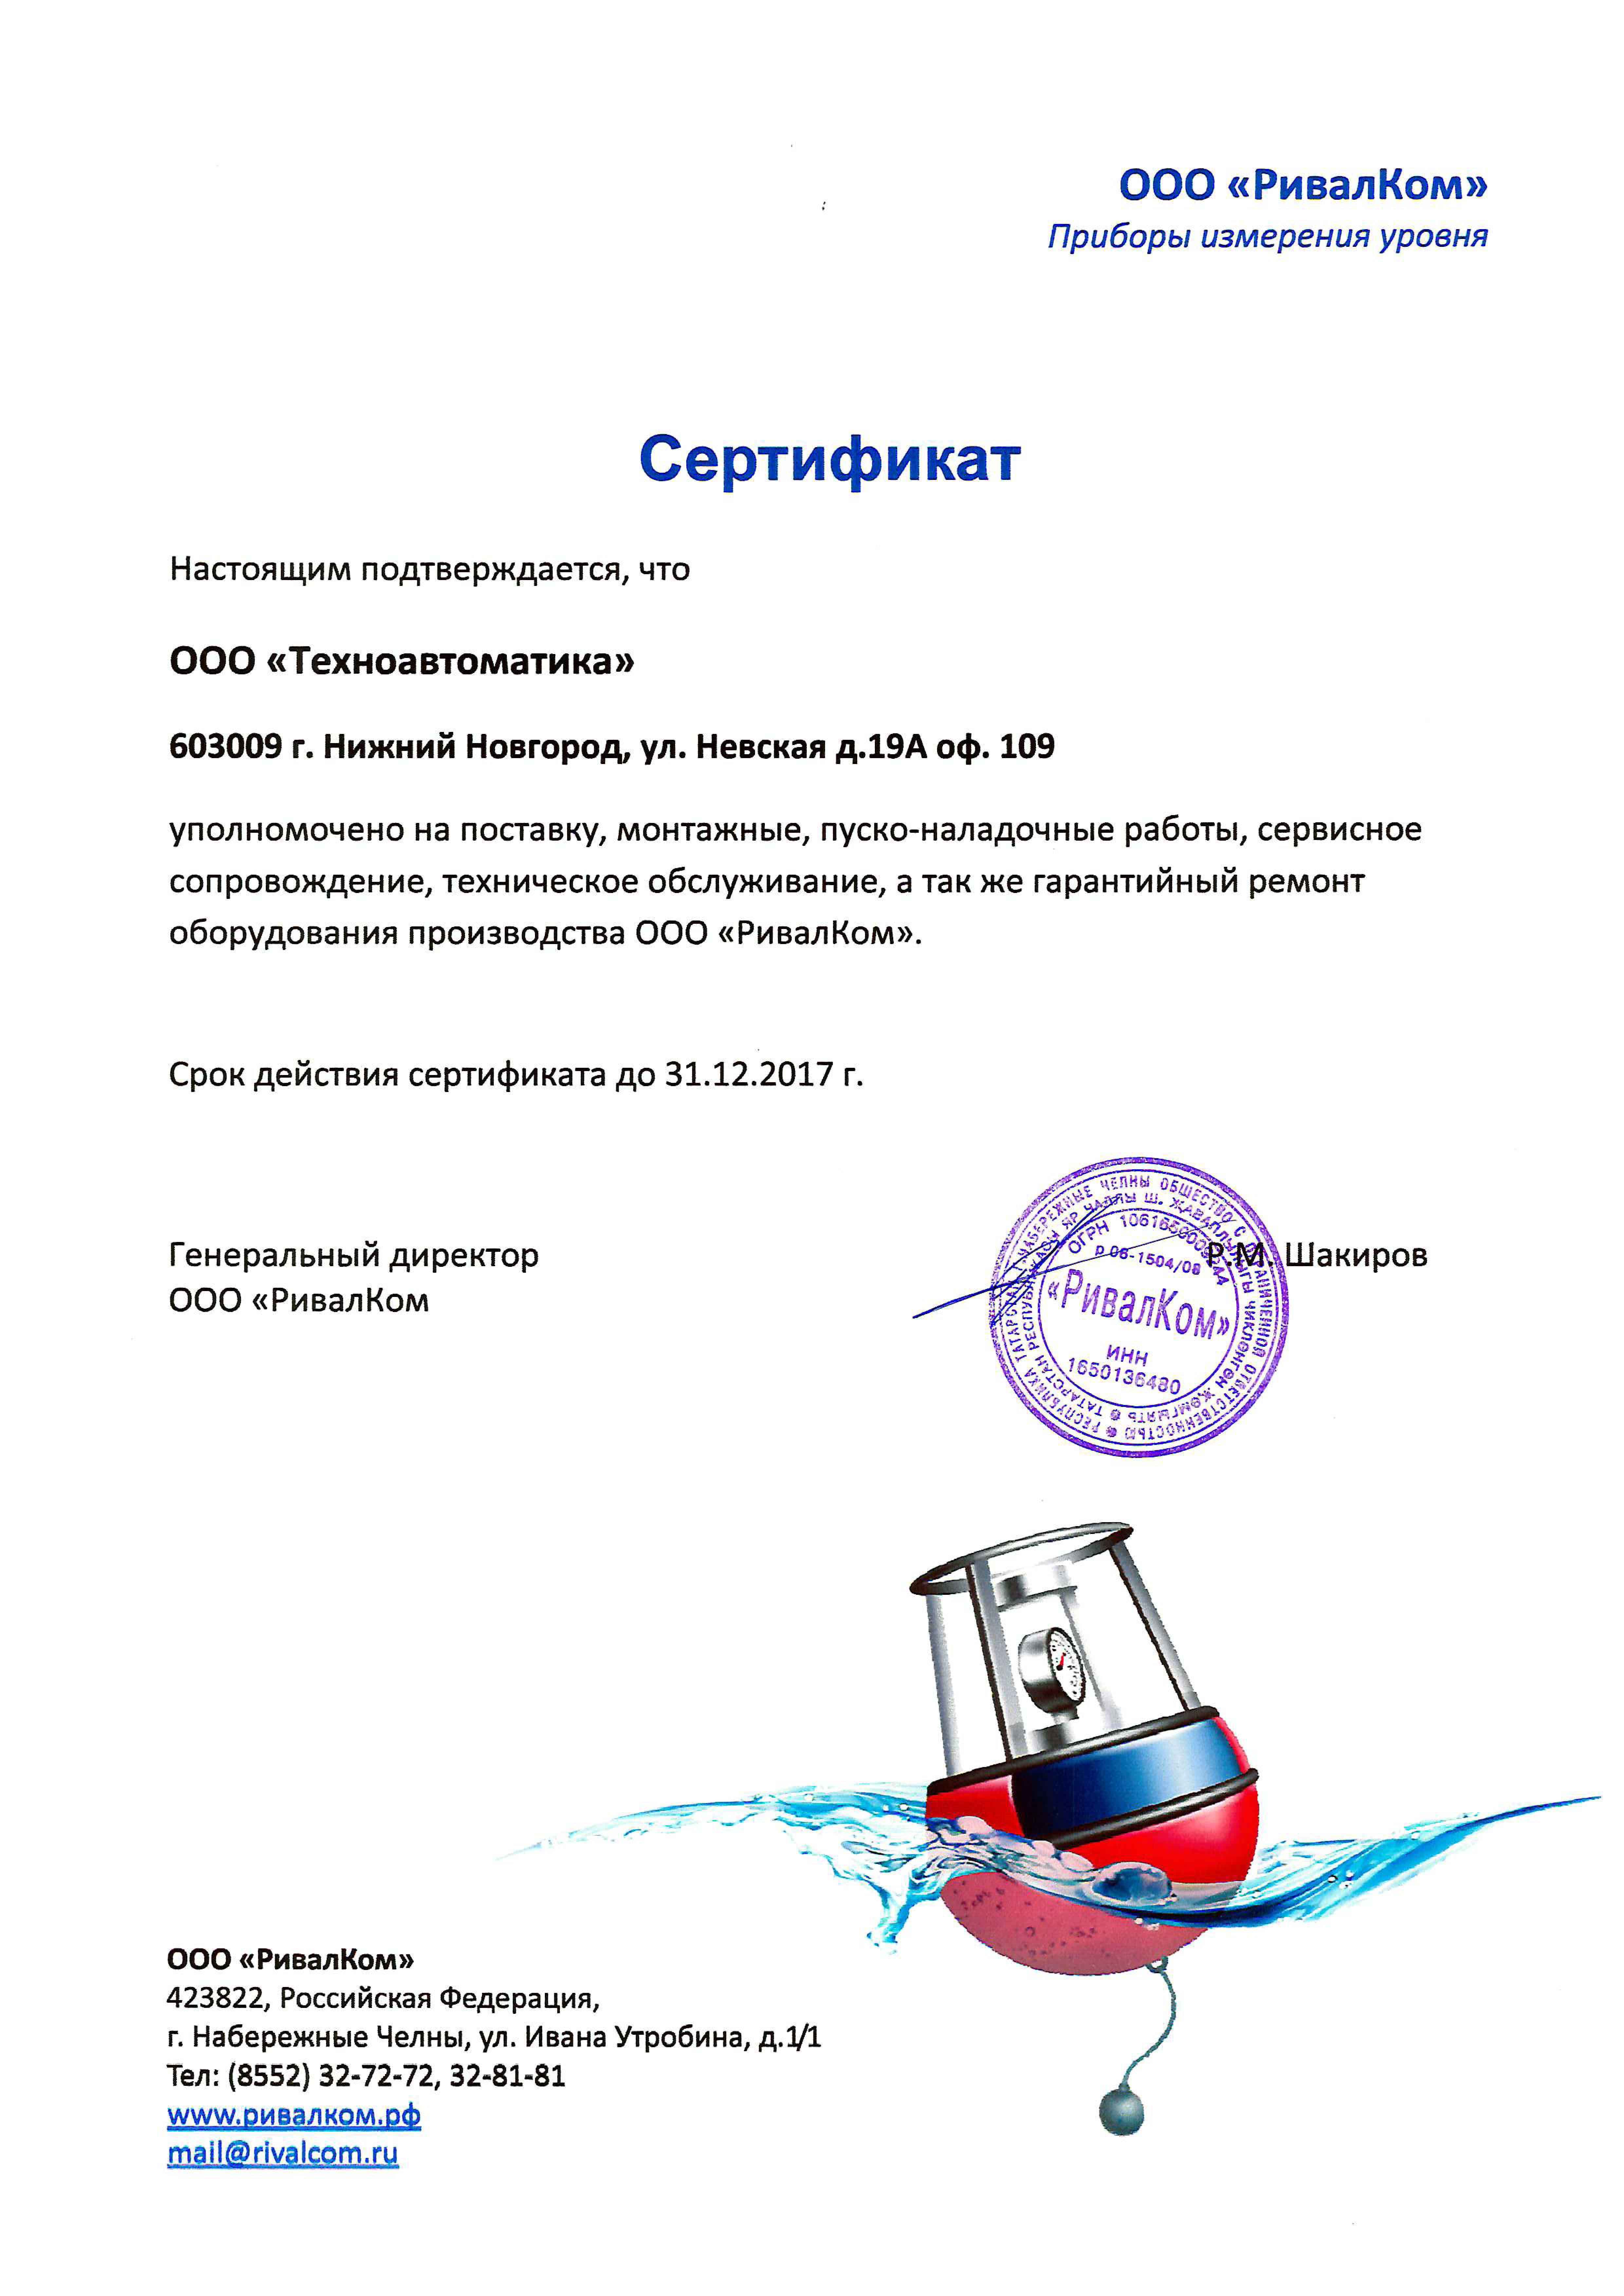 Сертификат дилера Техноавтоматика 2017